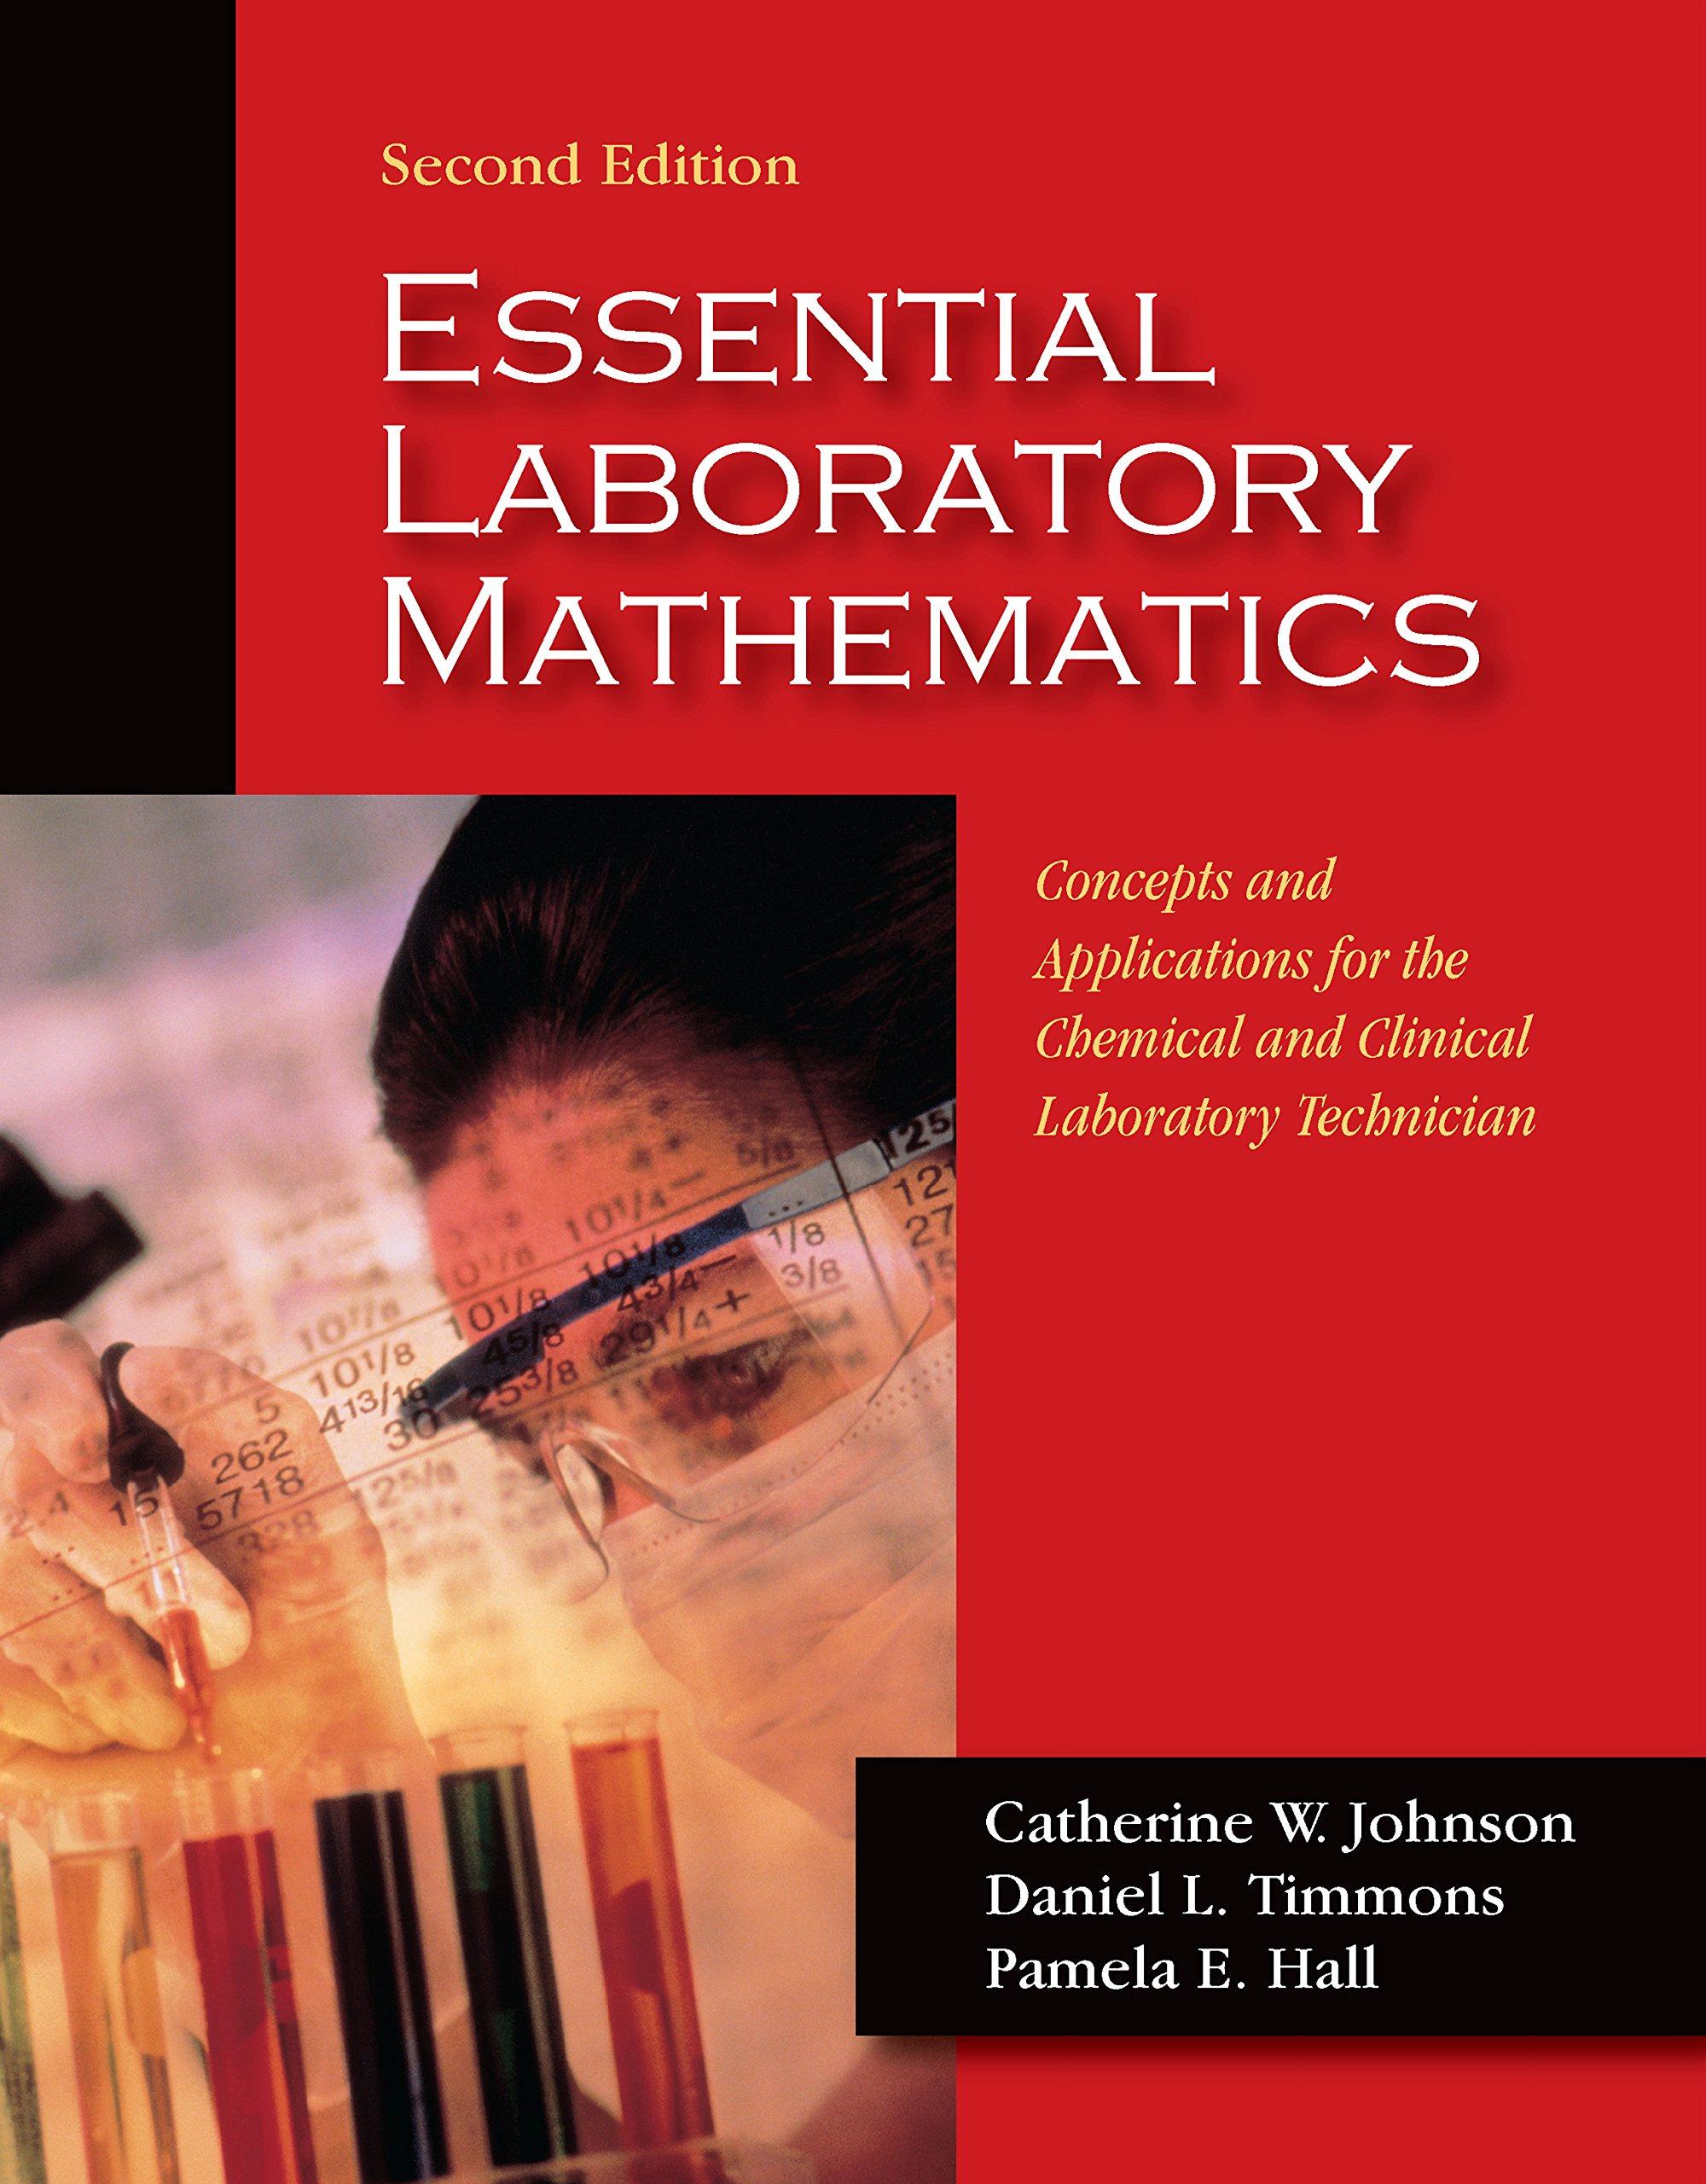 Clinical Chemistry Laboratory Manual Pdf